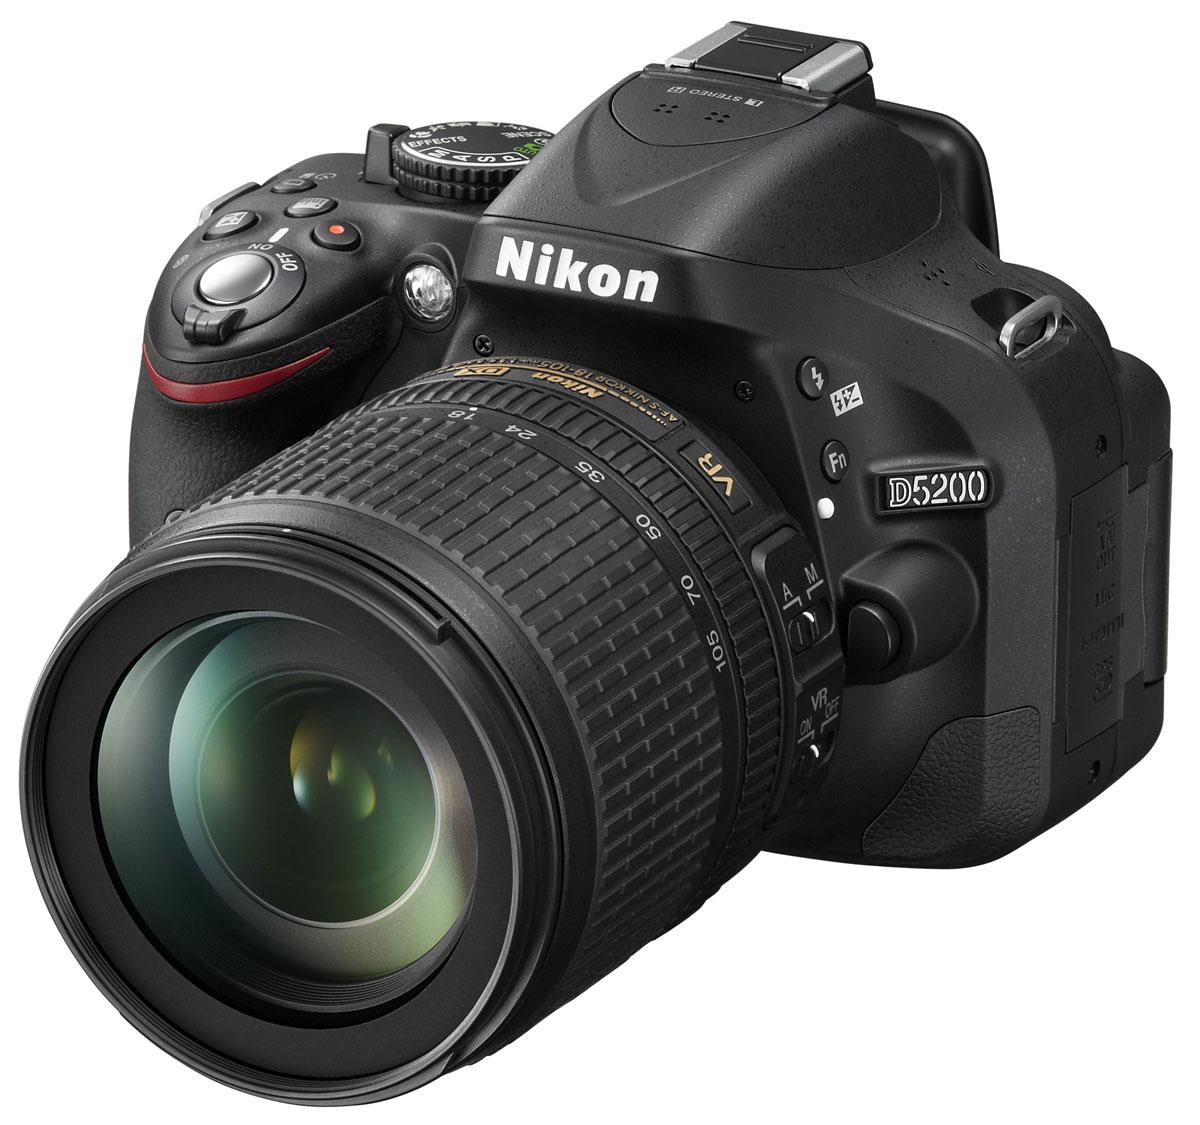 Nikon D5200 Kit 18-105 VR, Black цифровая фотокамера ( VBA350K005 )